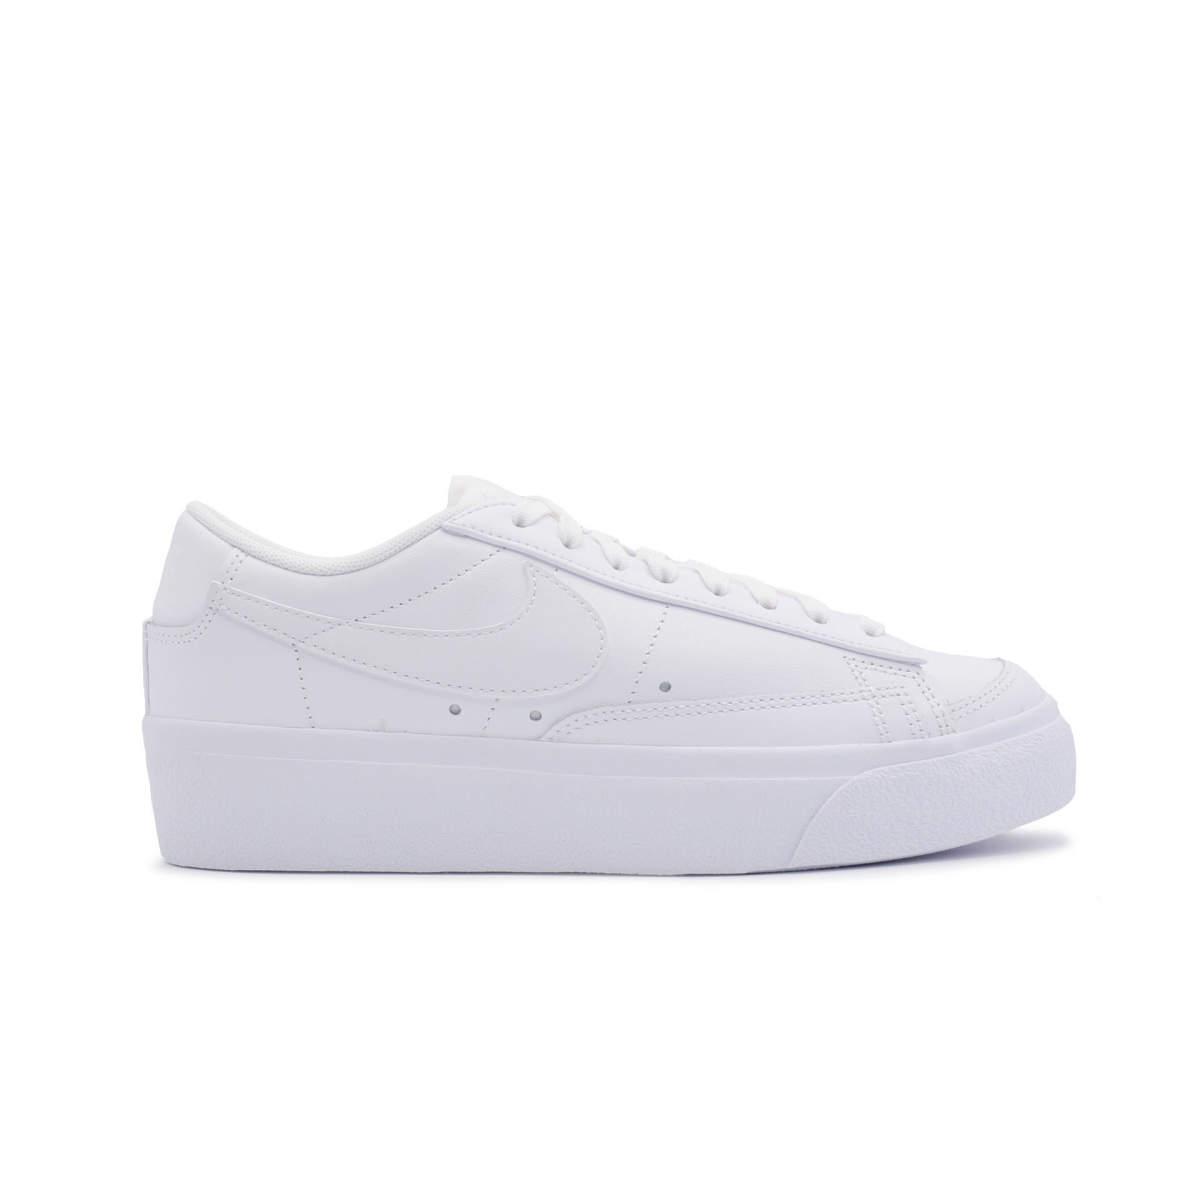 Wmns blazer low platform white